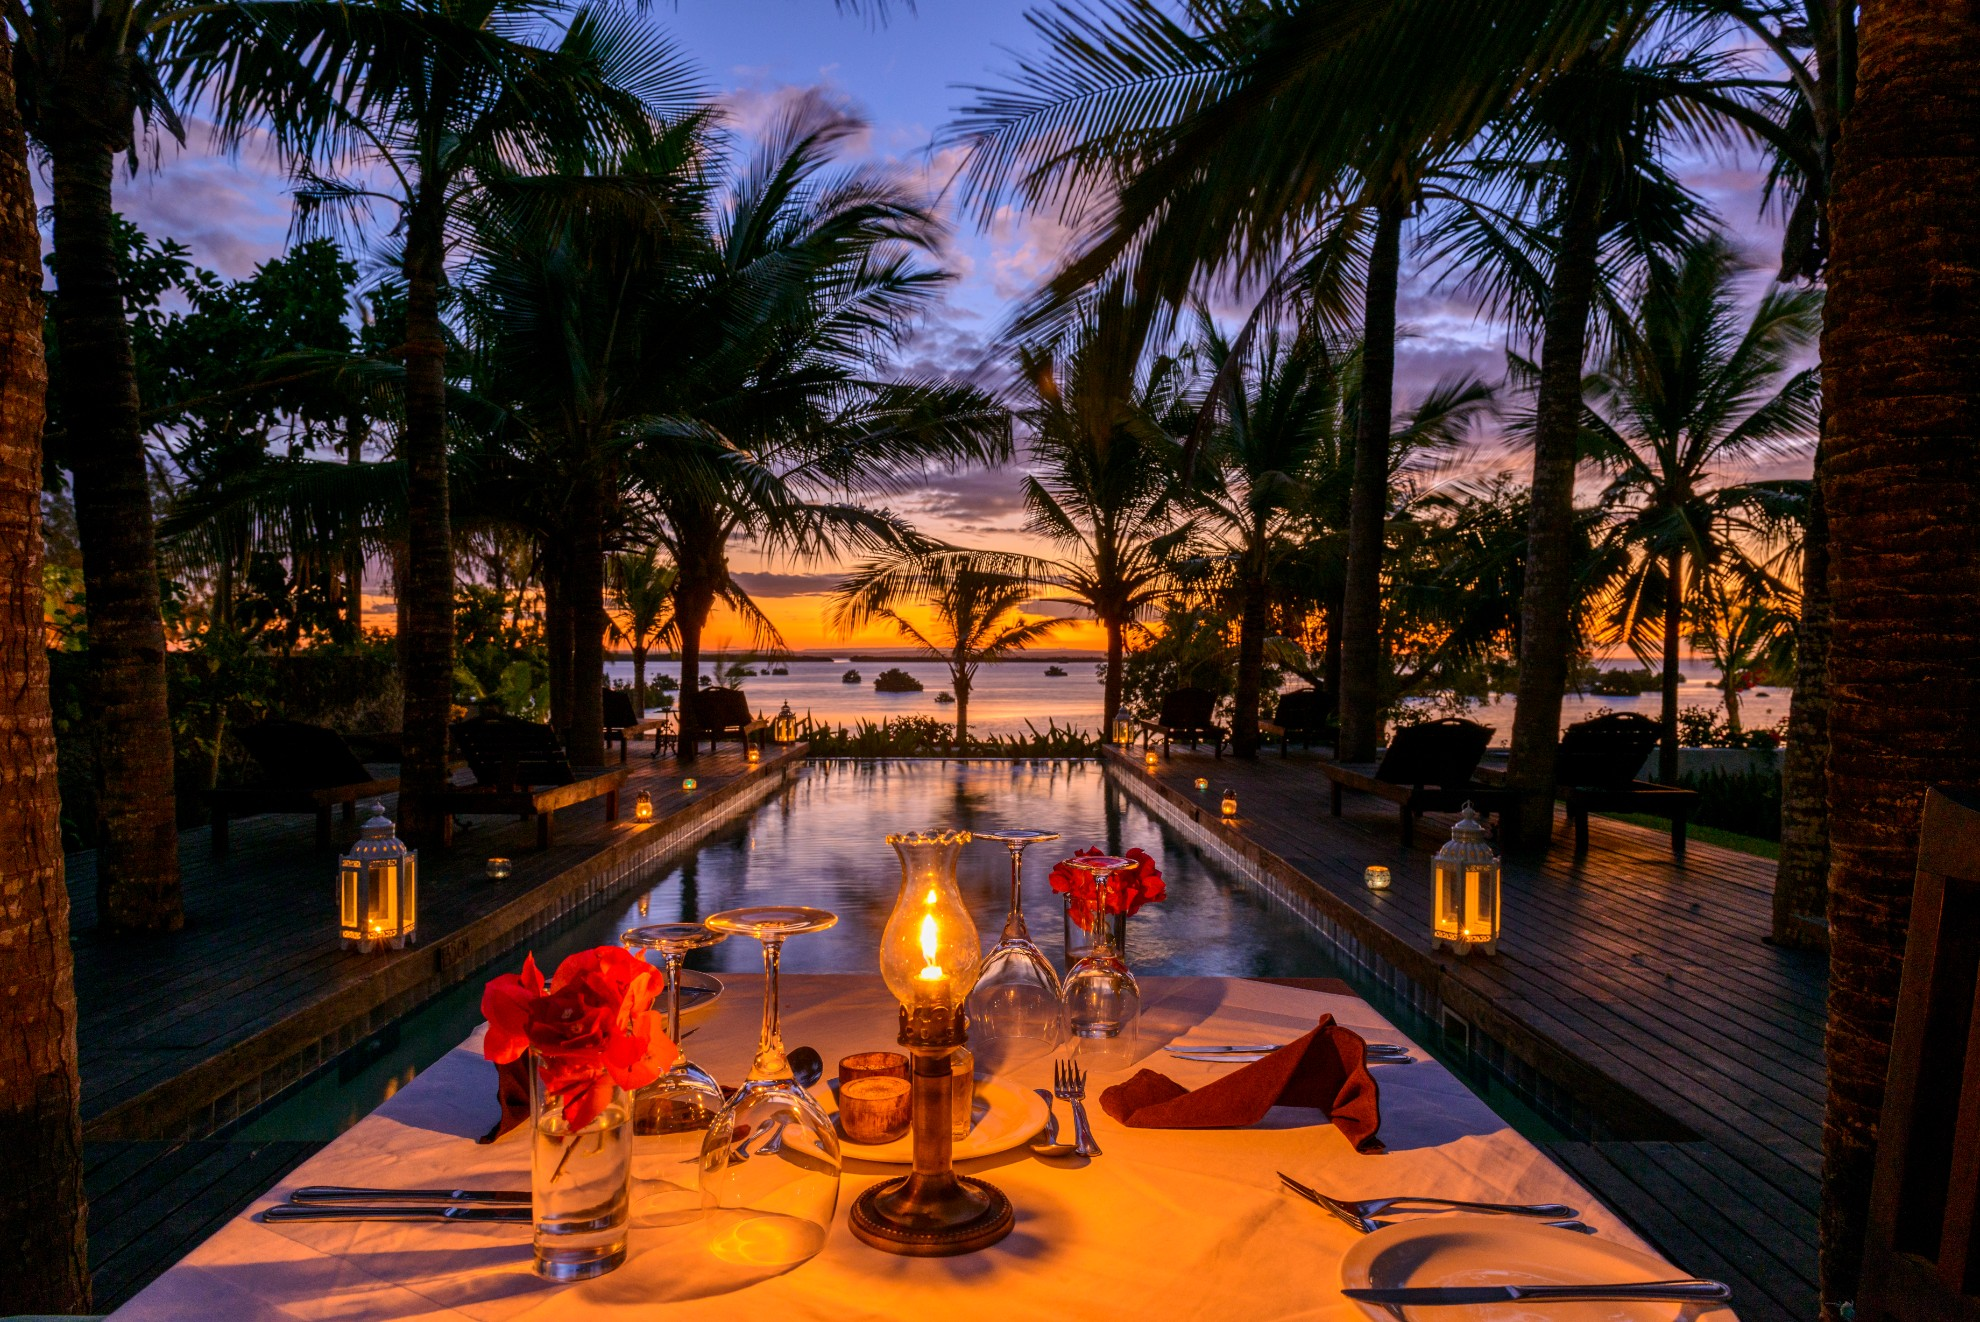 Ibo Island Lodge Poolside Dinner